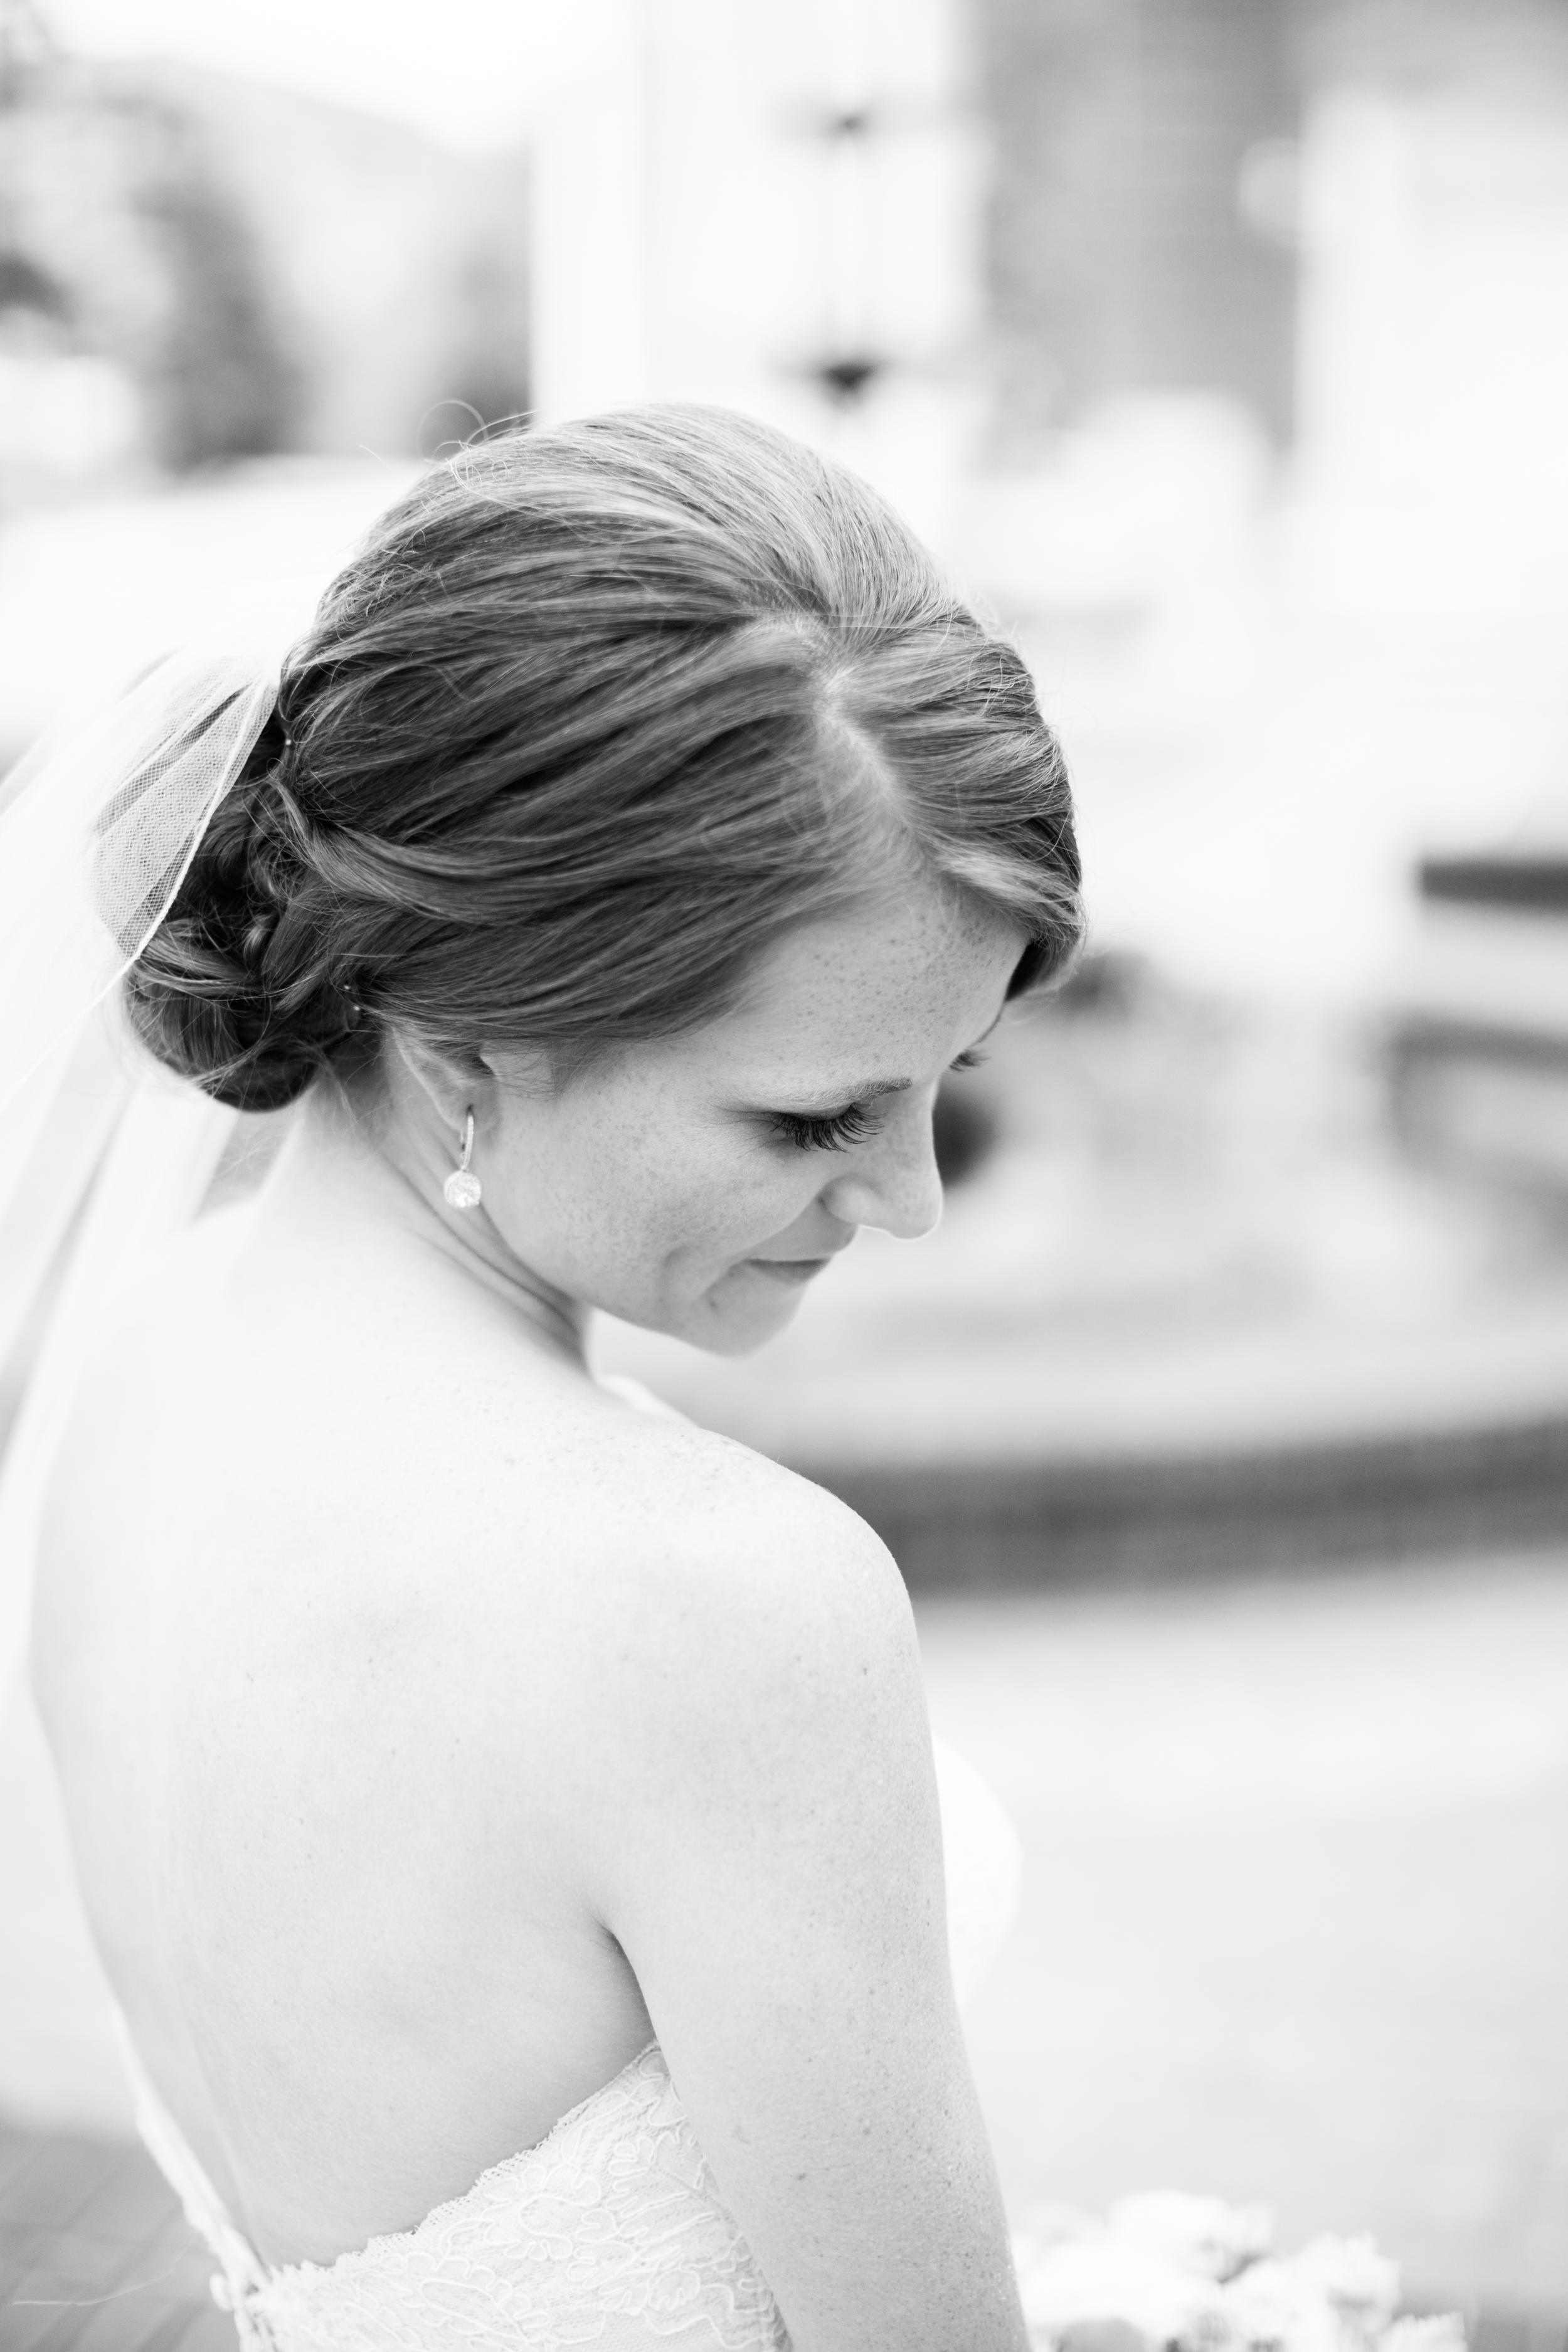 Brewbaker-Wedding-Montgomery-Alabama-Nick-Drollette-108.jpg